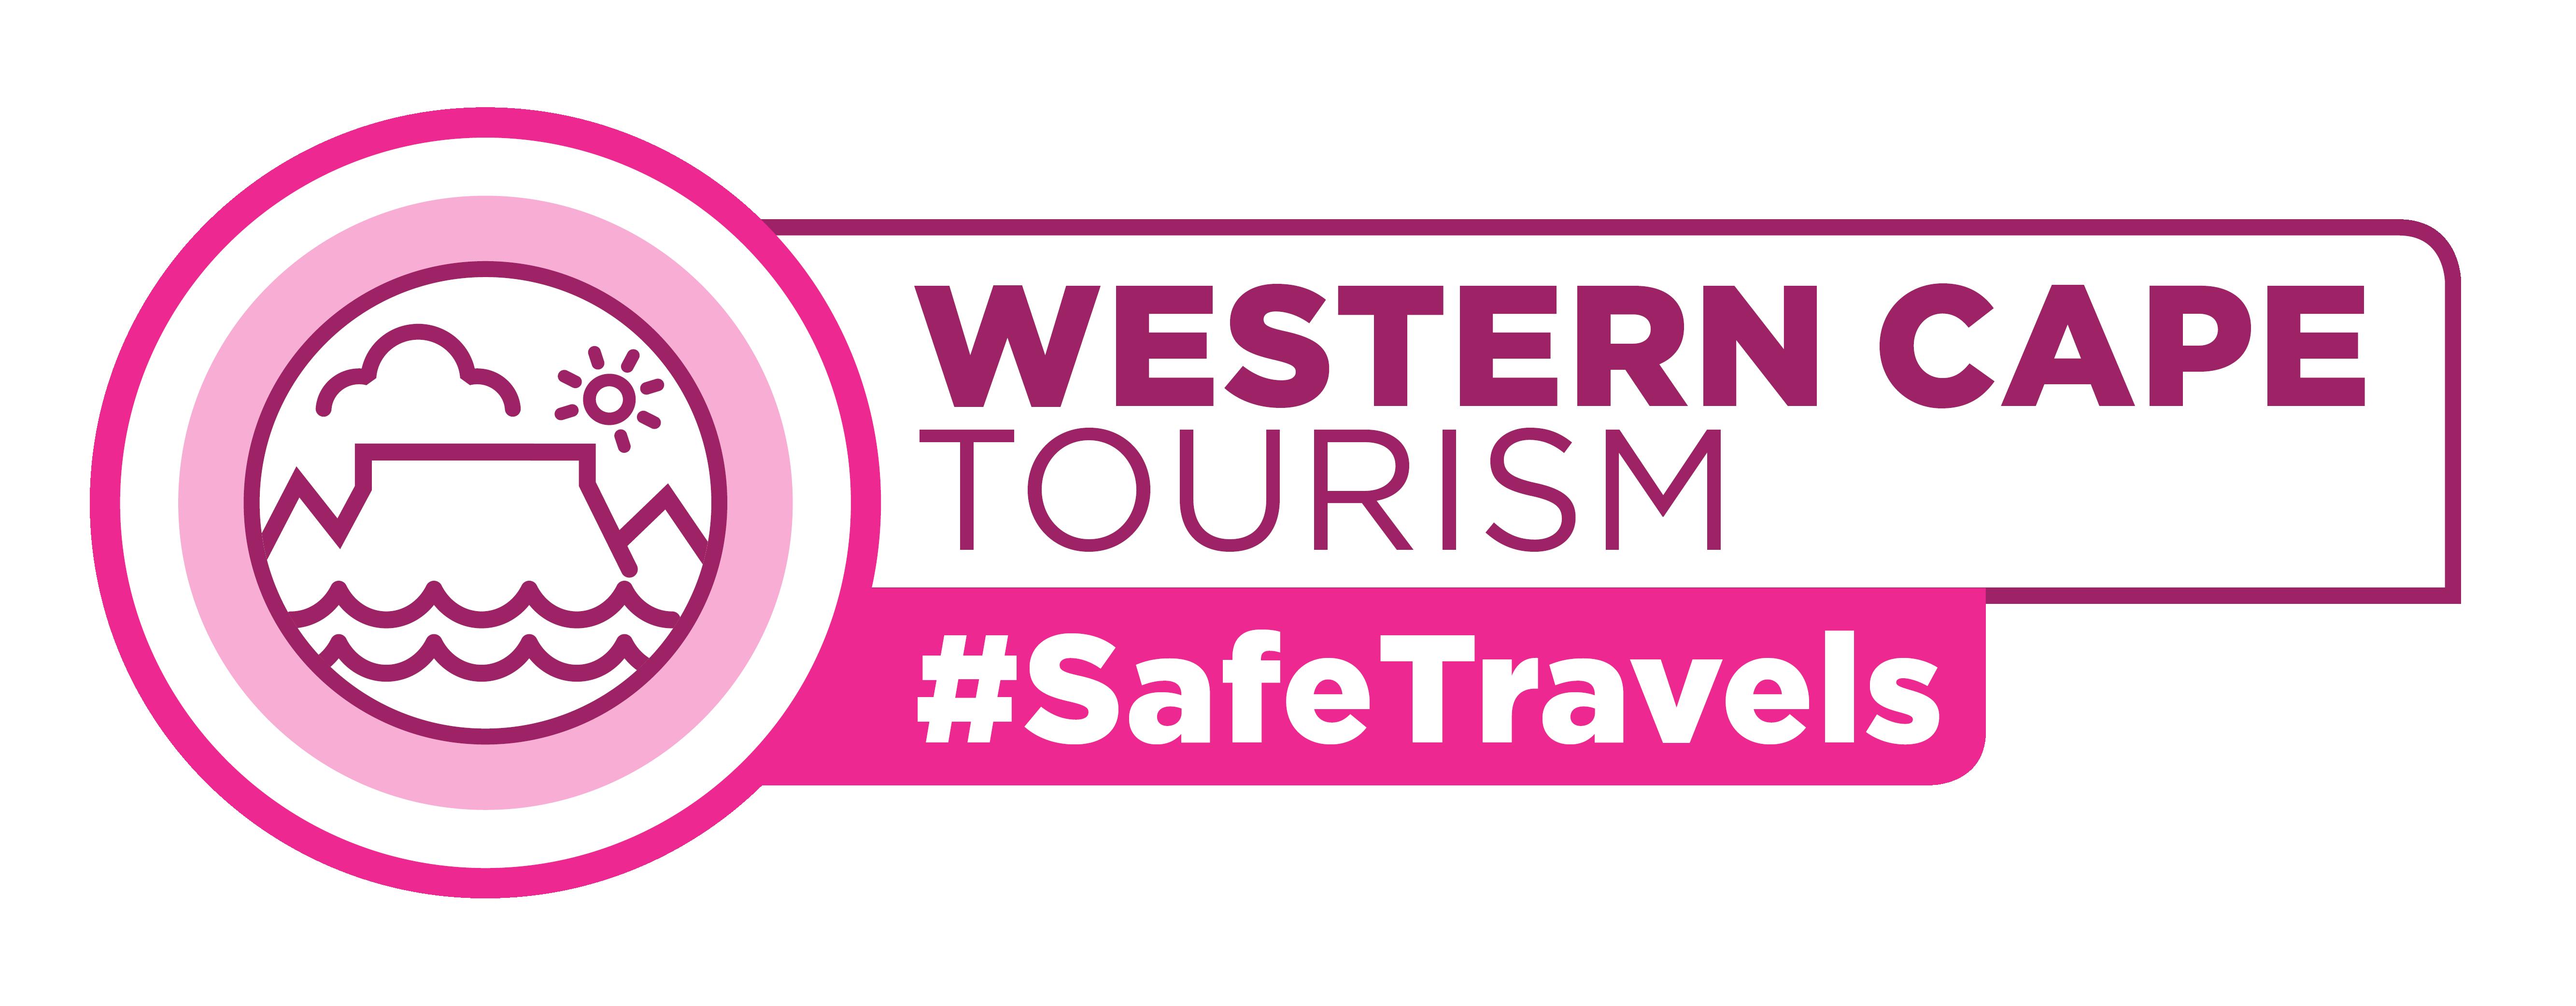 tourism_webinar_logos_final_4.png